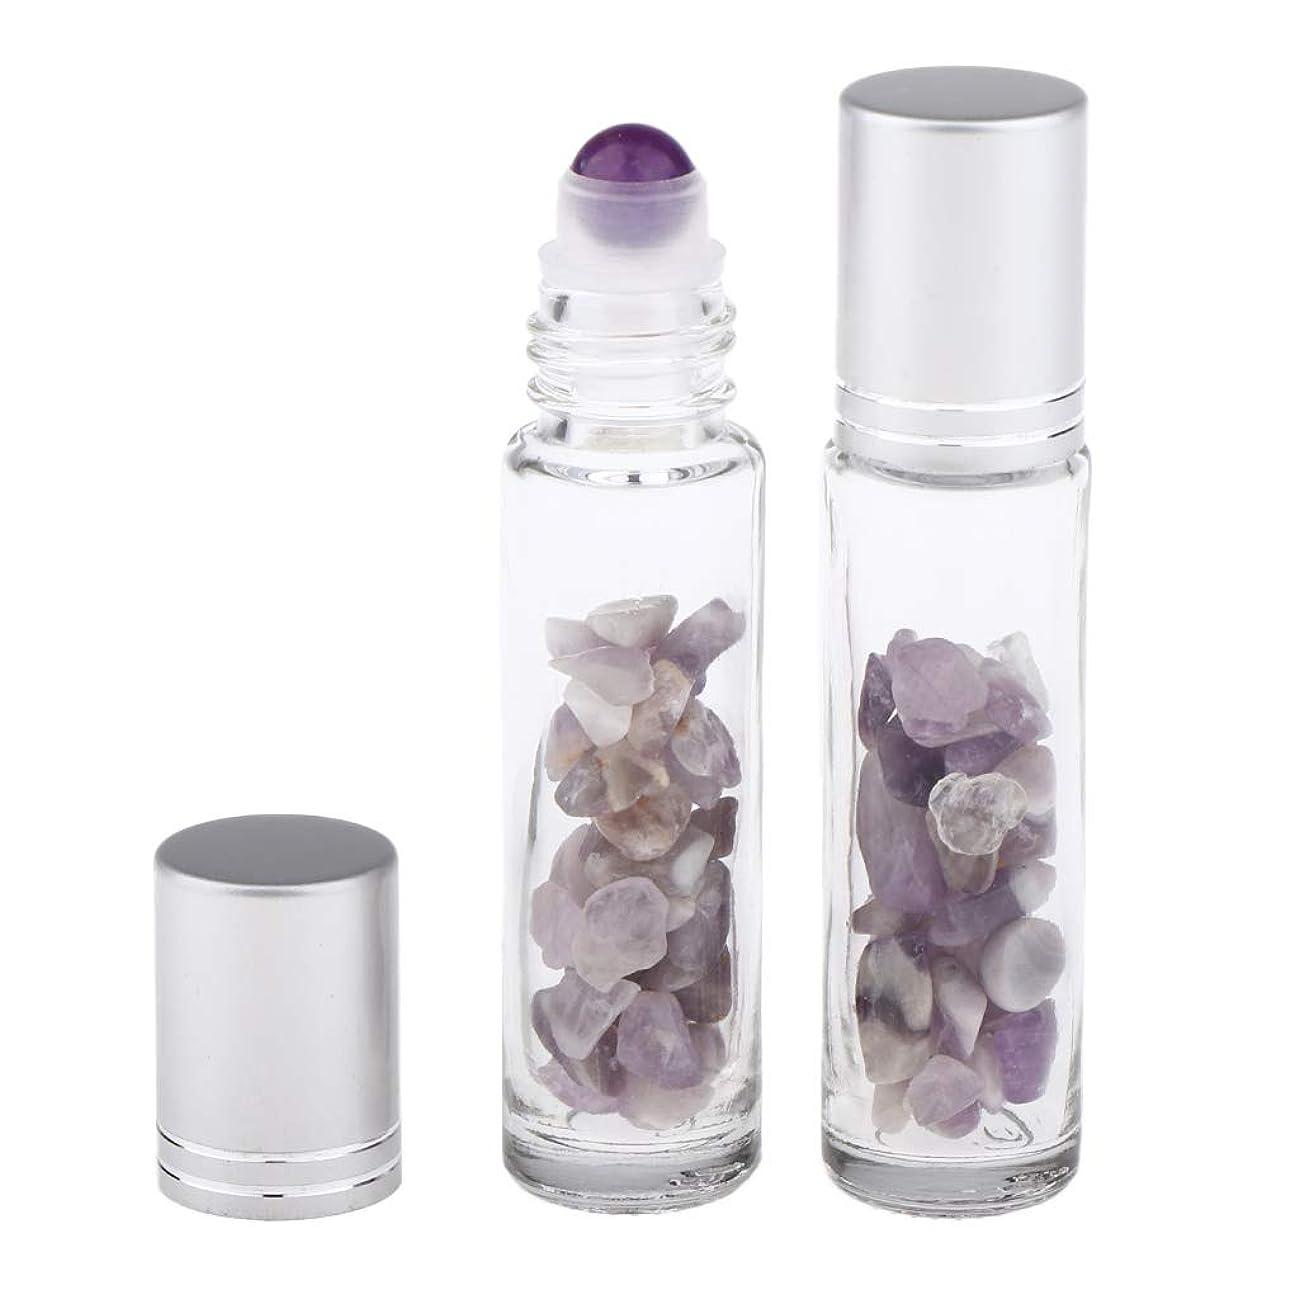 Hellery 10ml ガラスボトル 香水ボトル 精油瓶 アトマイザー 詰替え ロールオンボトル 天然石 2個 - アメジスト